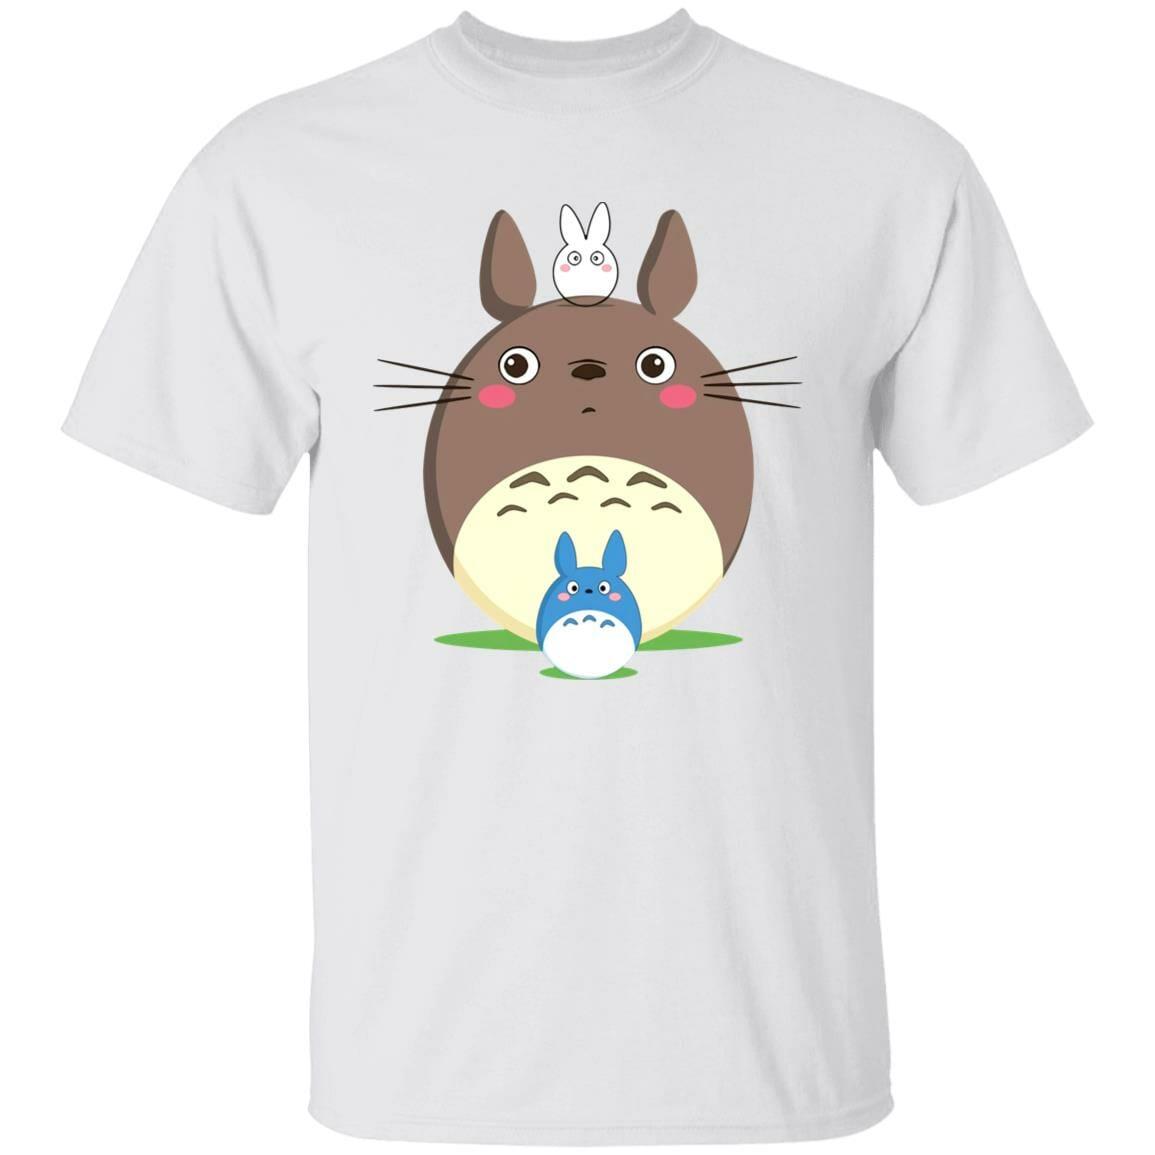 Circle Totoro T Shirt